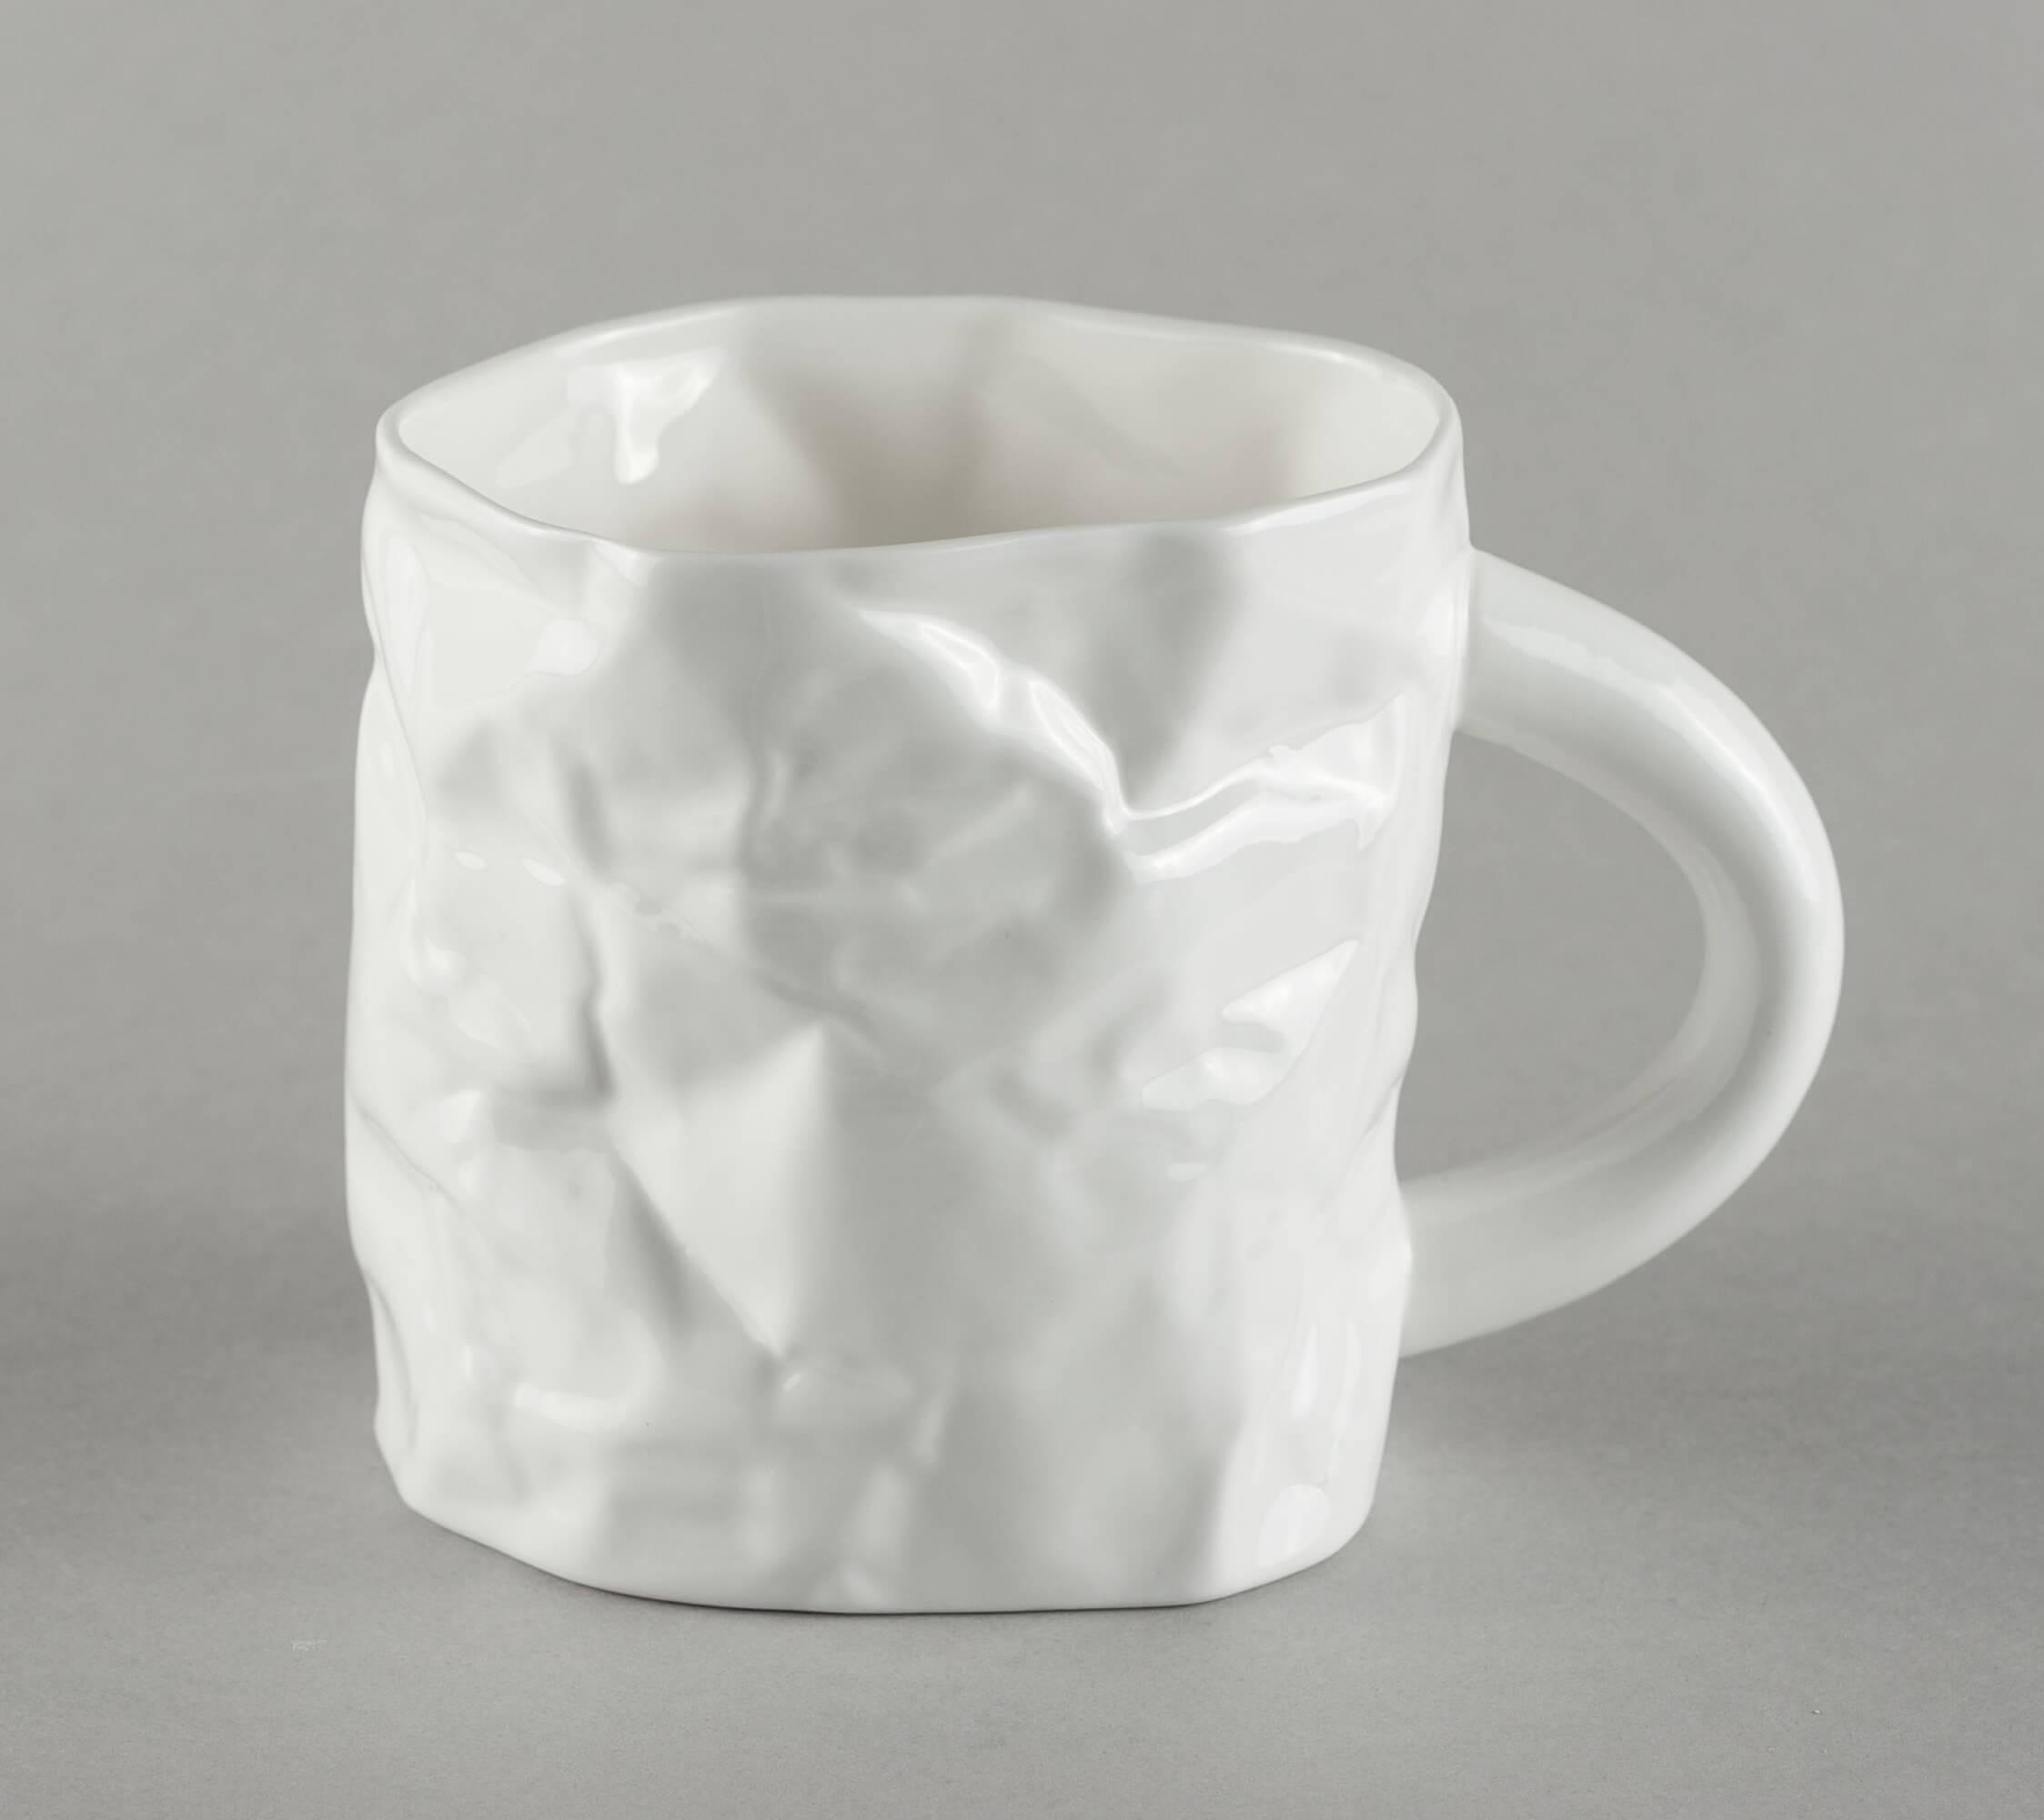 Piebalgas porcelain baltic design 4 Piebalga Porcelain